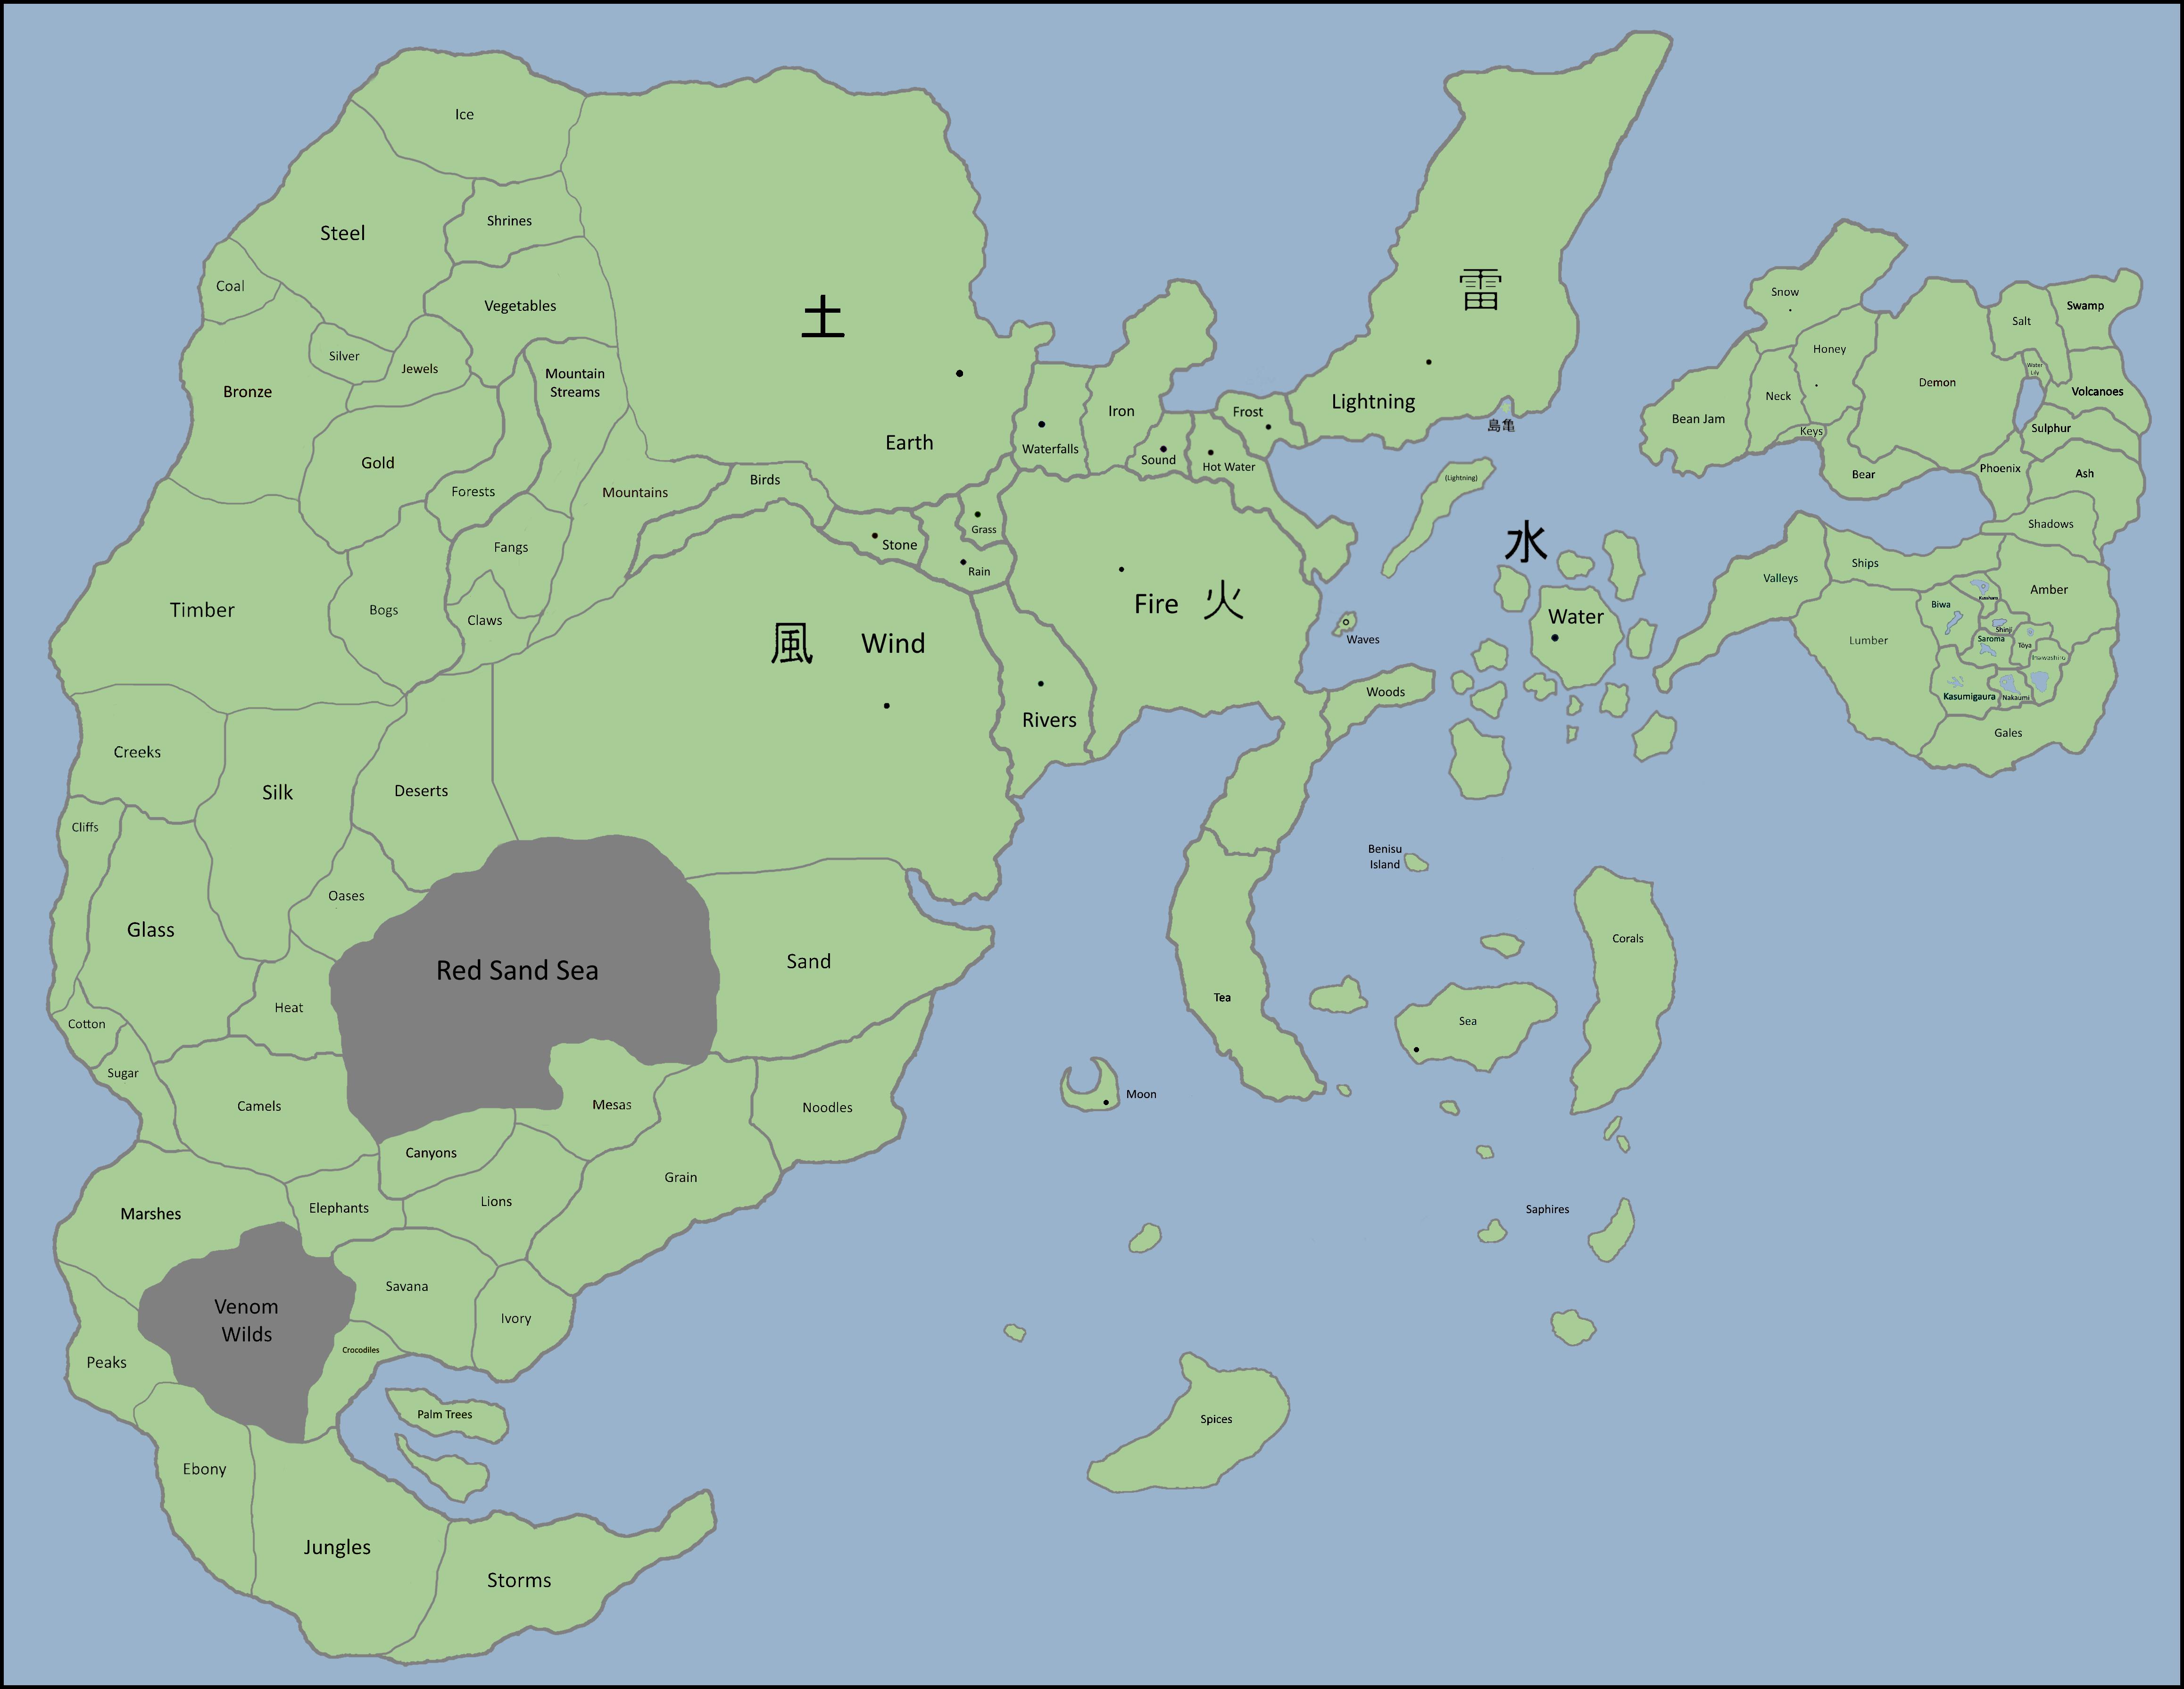 Naruto World Map - Canon by Eruaniel on DeviantArt